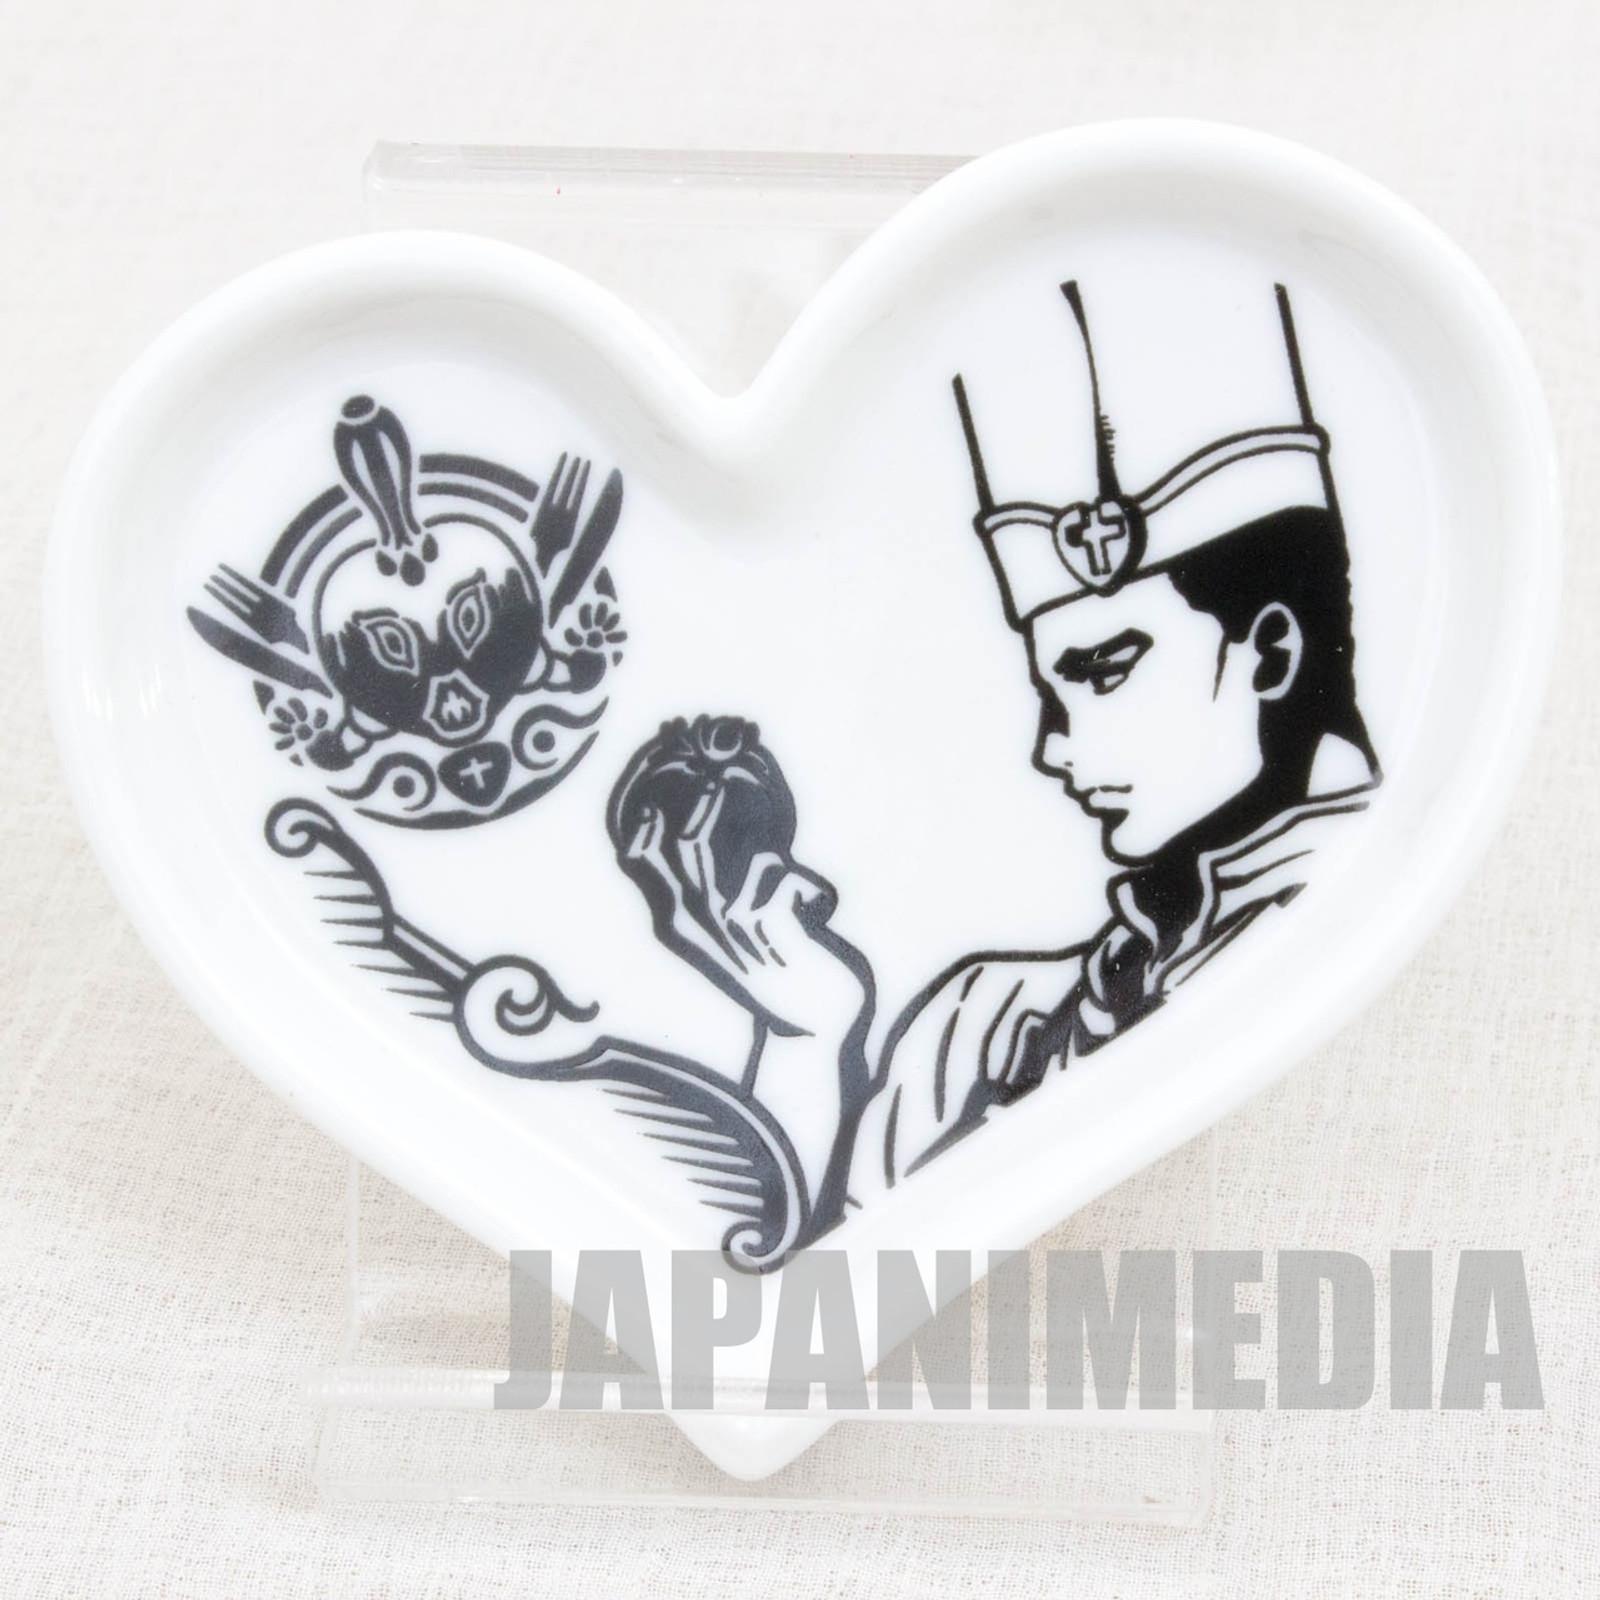 JoJo's Bizarre Adventure Diamond Is Unbreakable Tonio Trussardi Small Plate